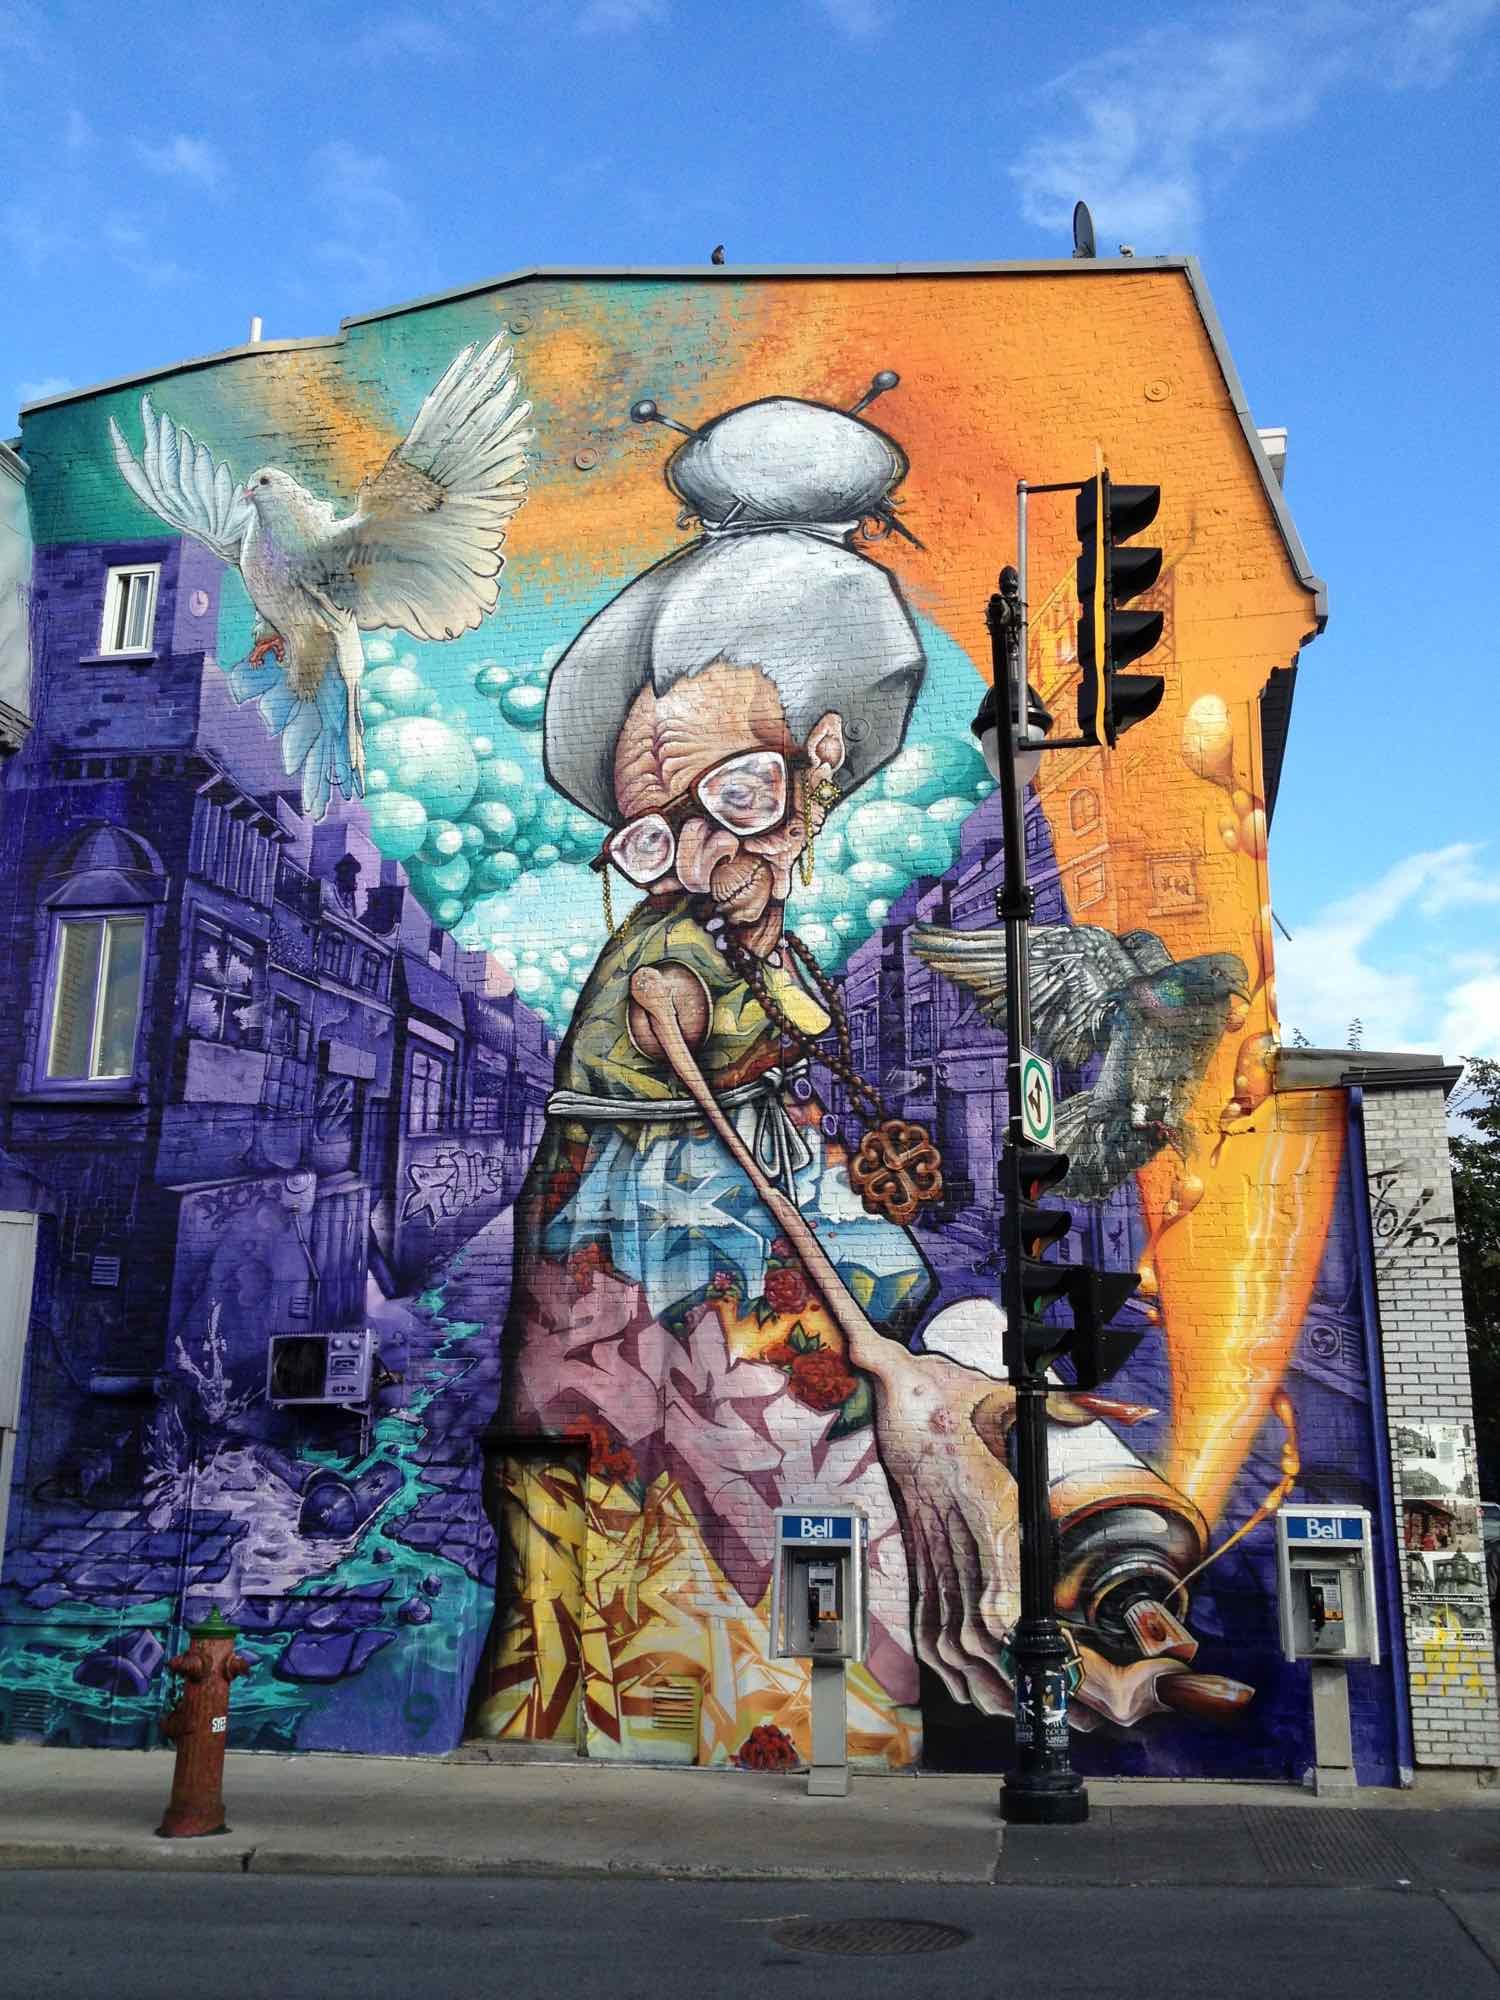 The_Walls_Of_Montreal-Ezra_Soiferman - 22.jpg